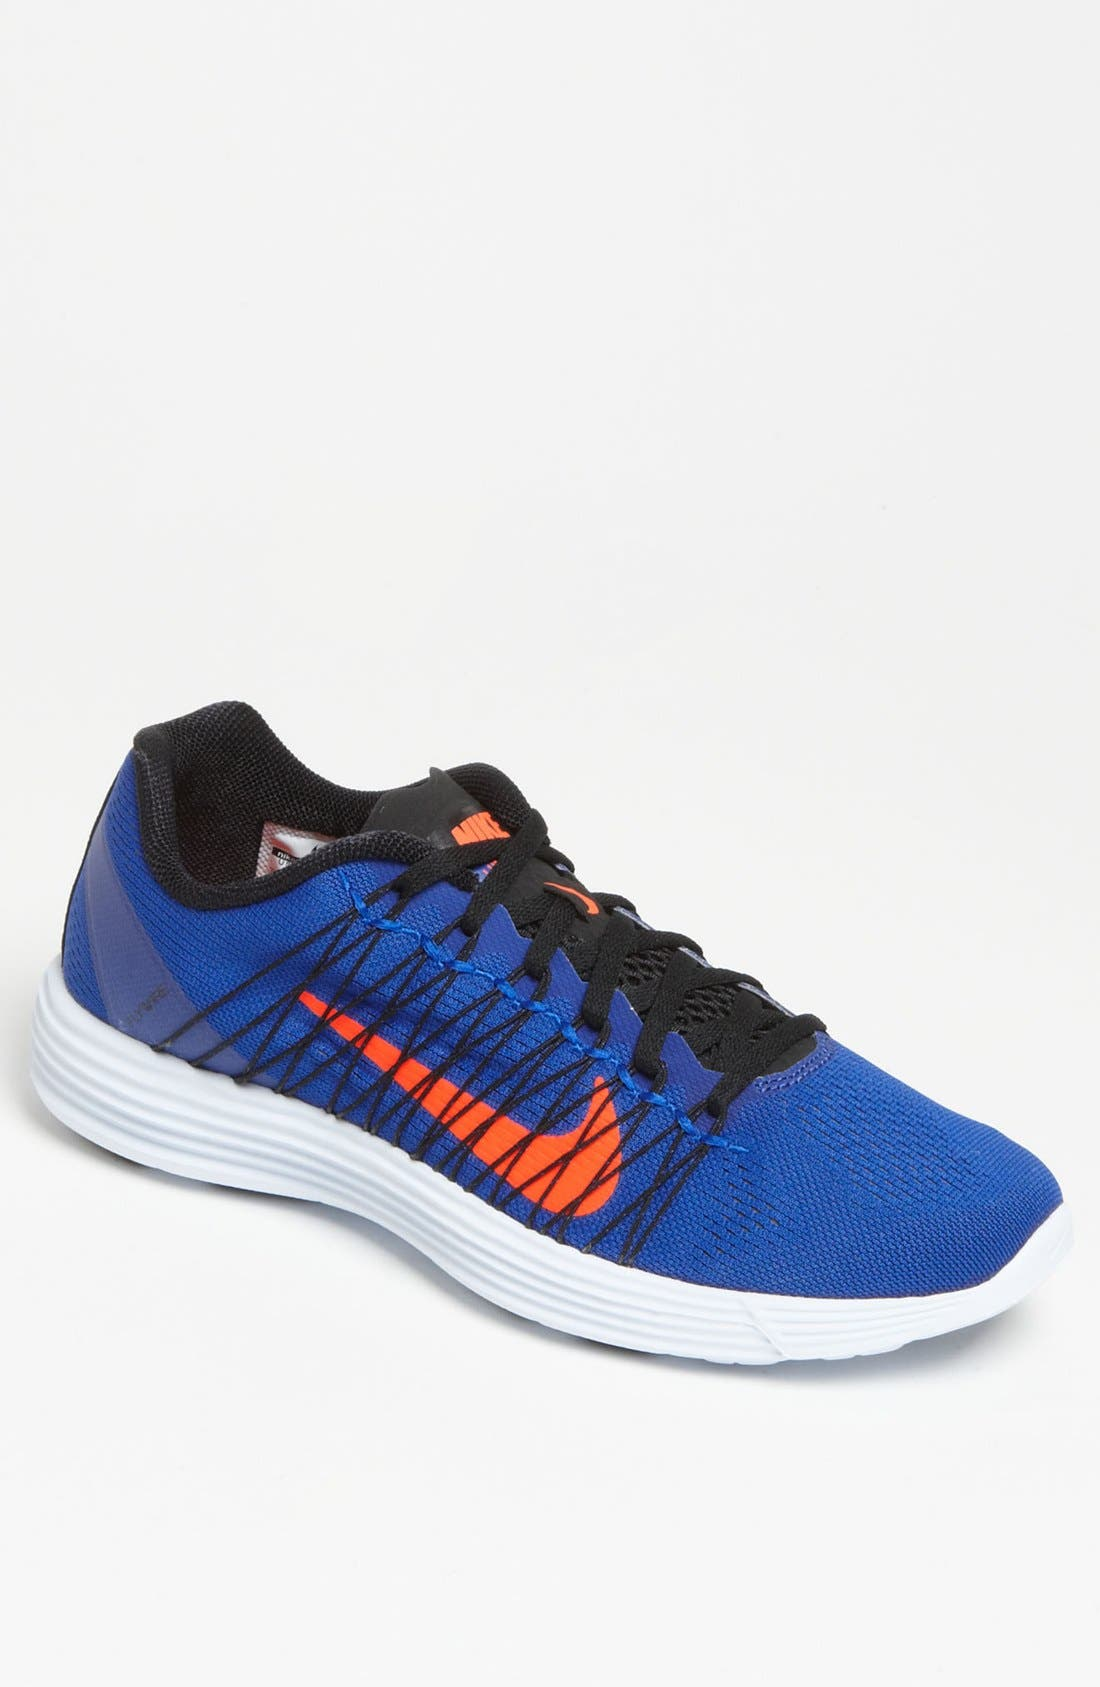 Main Image - Nike 'Lunaracer+ 3' Running Shoe (Men)